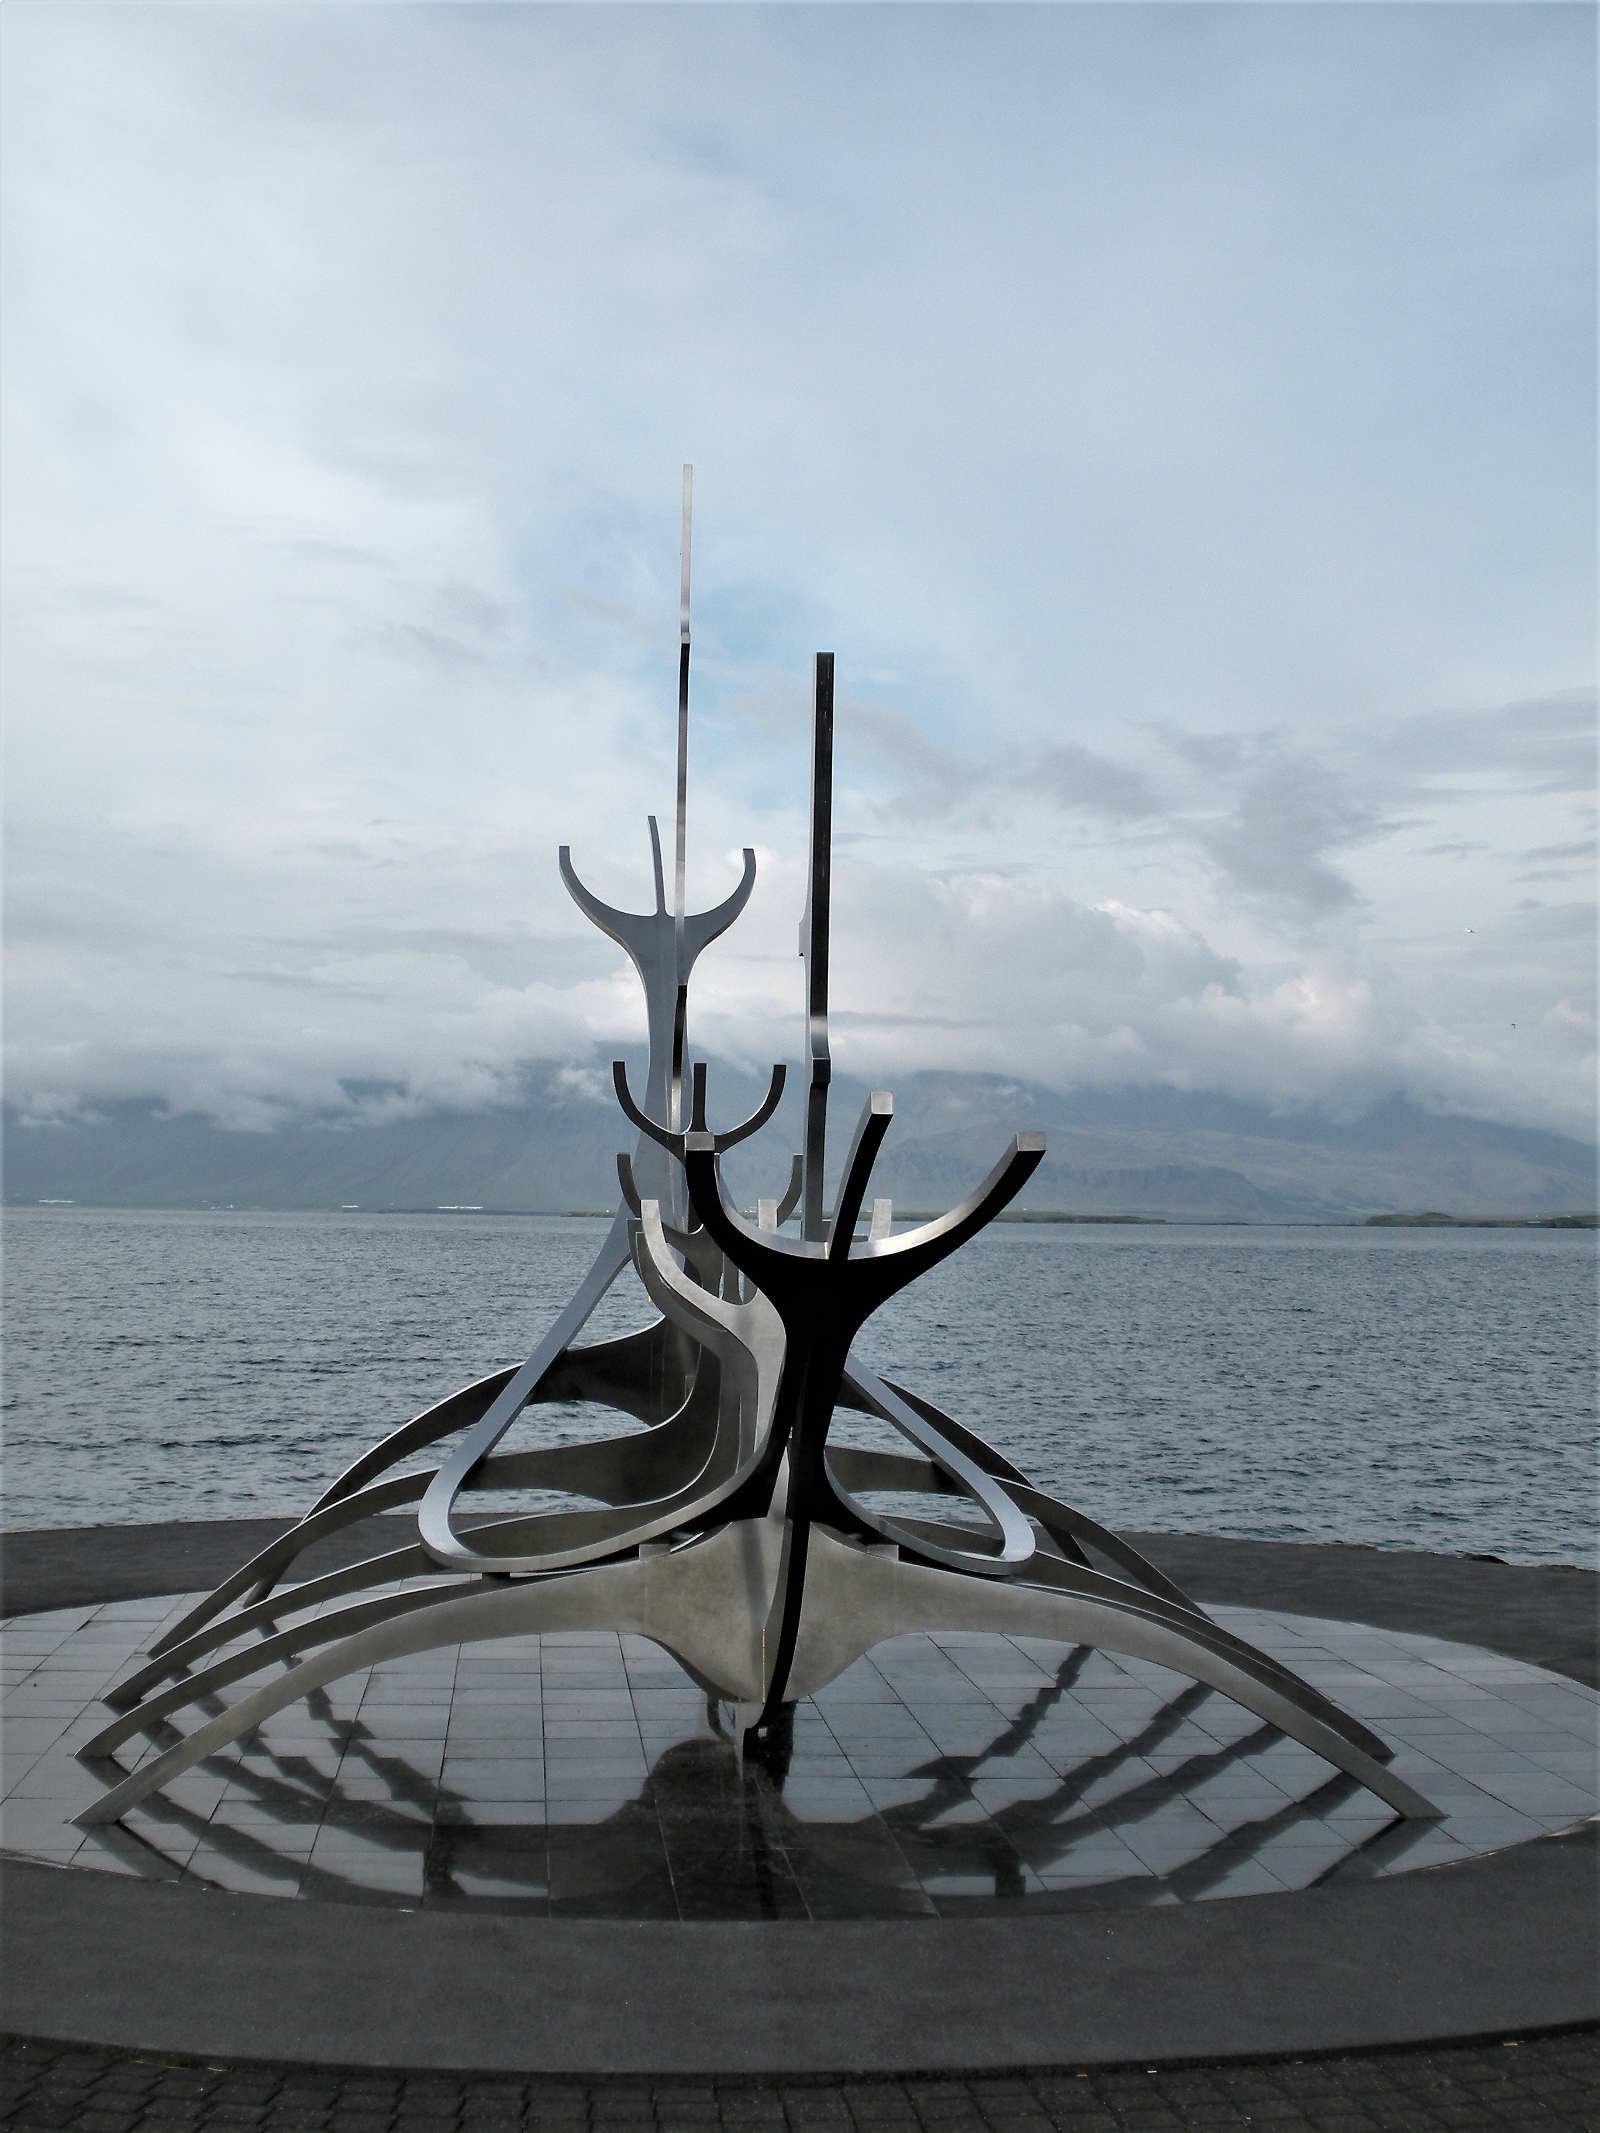 La Statua di acciaio Sun Voyager a Reykjavik in Islanda Europa